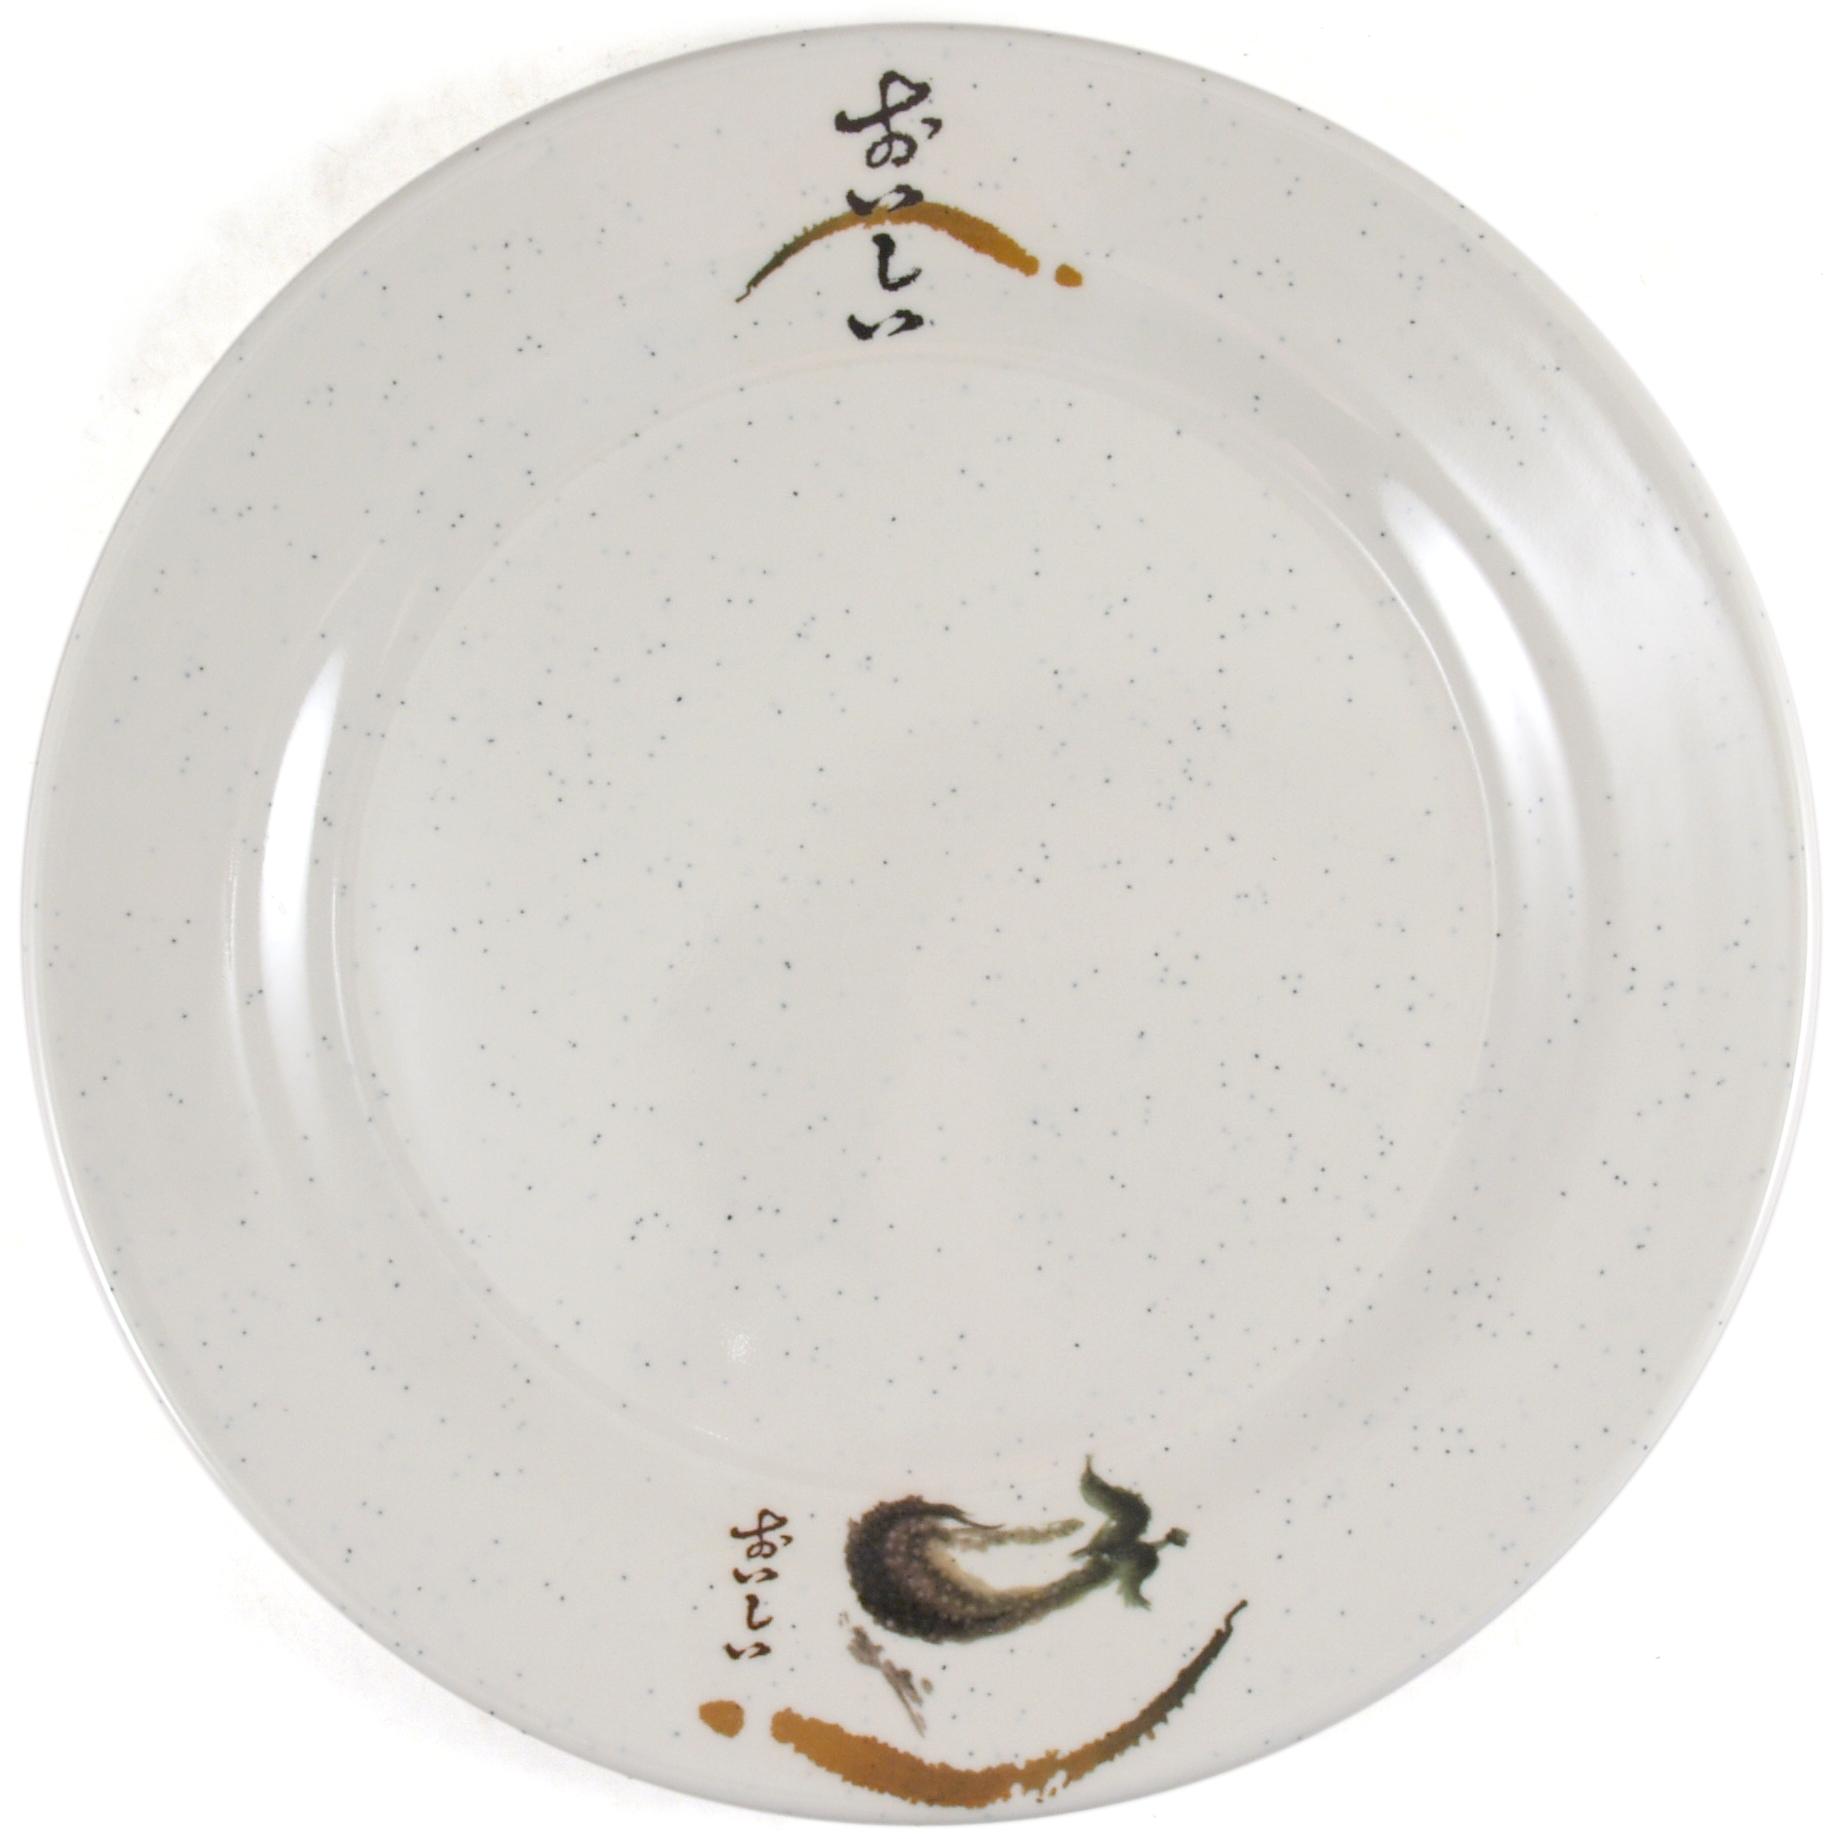 sc 1 st  BigKitchen & Japanese Oishii Cream Melamine Eggplant 10 Inch Dinner Plate Set of 4